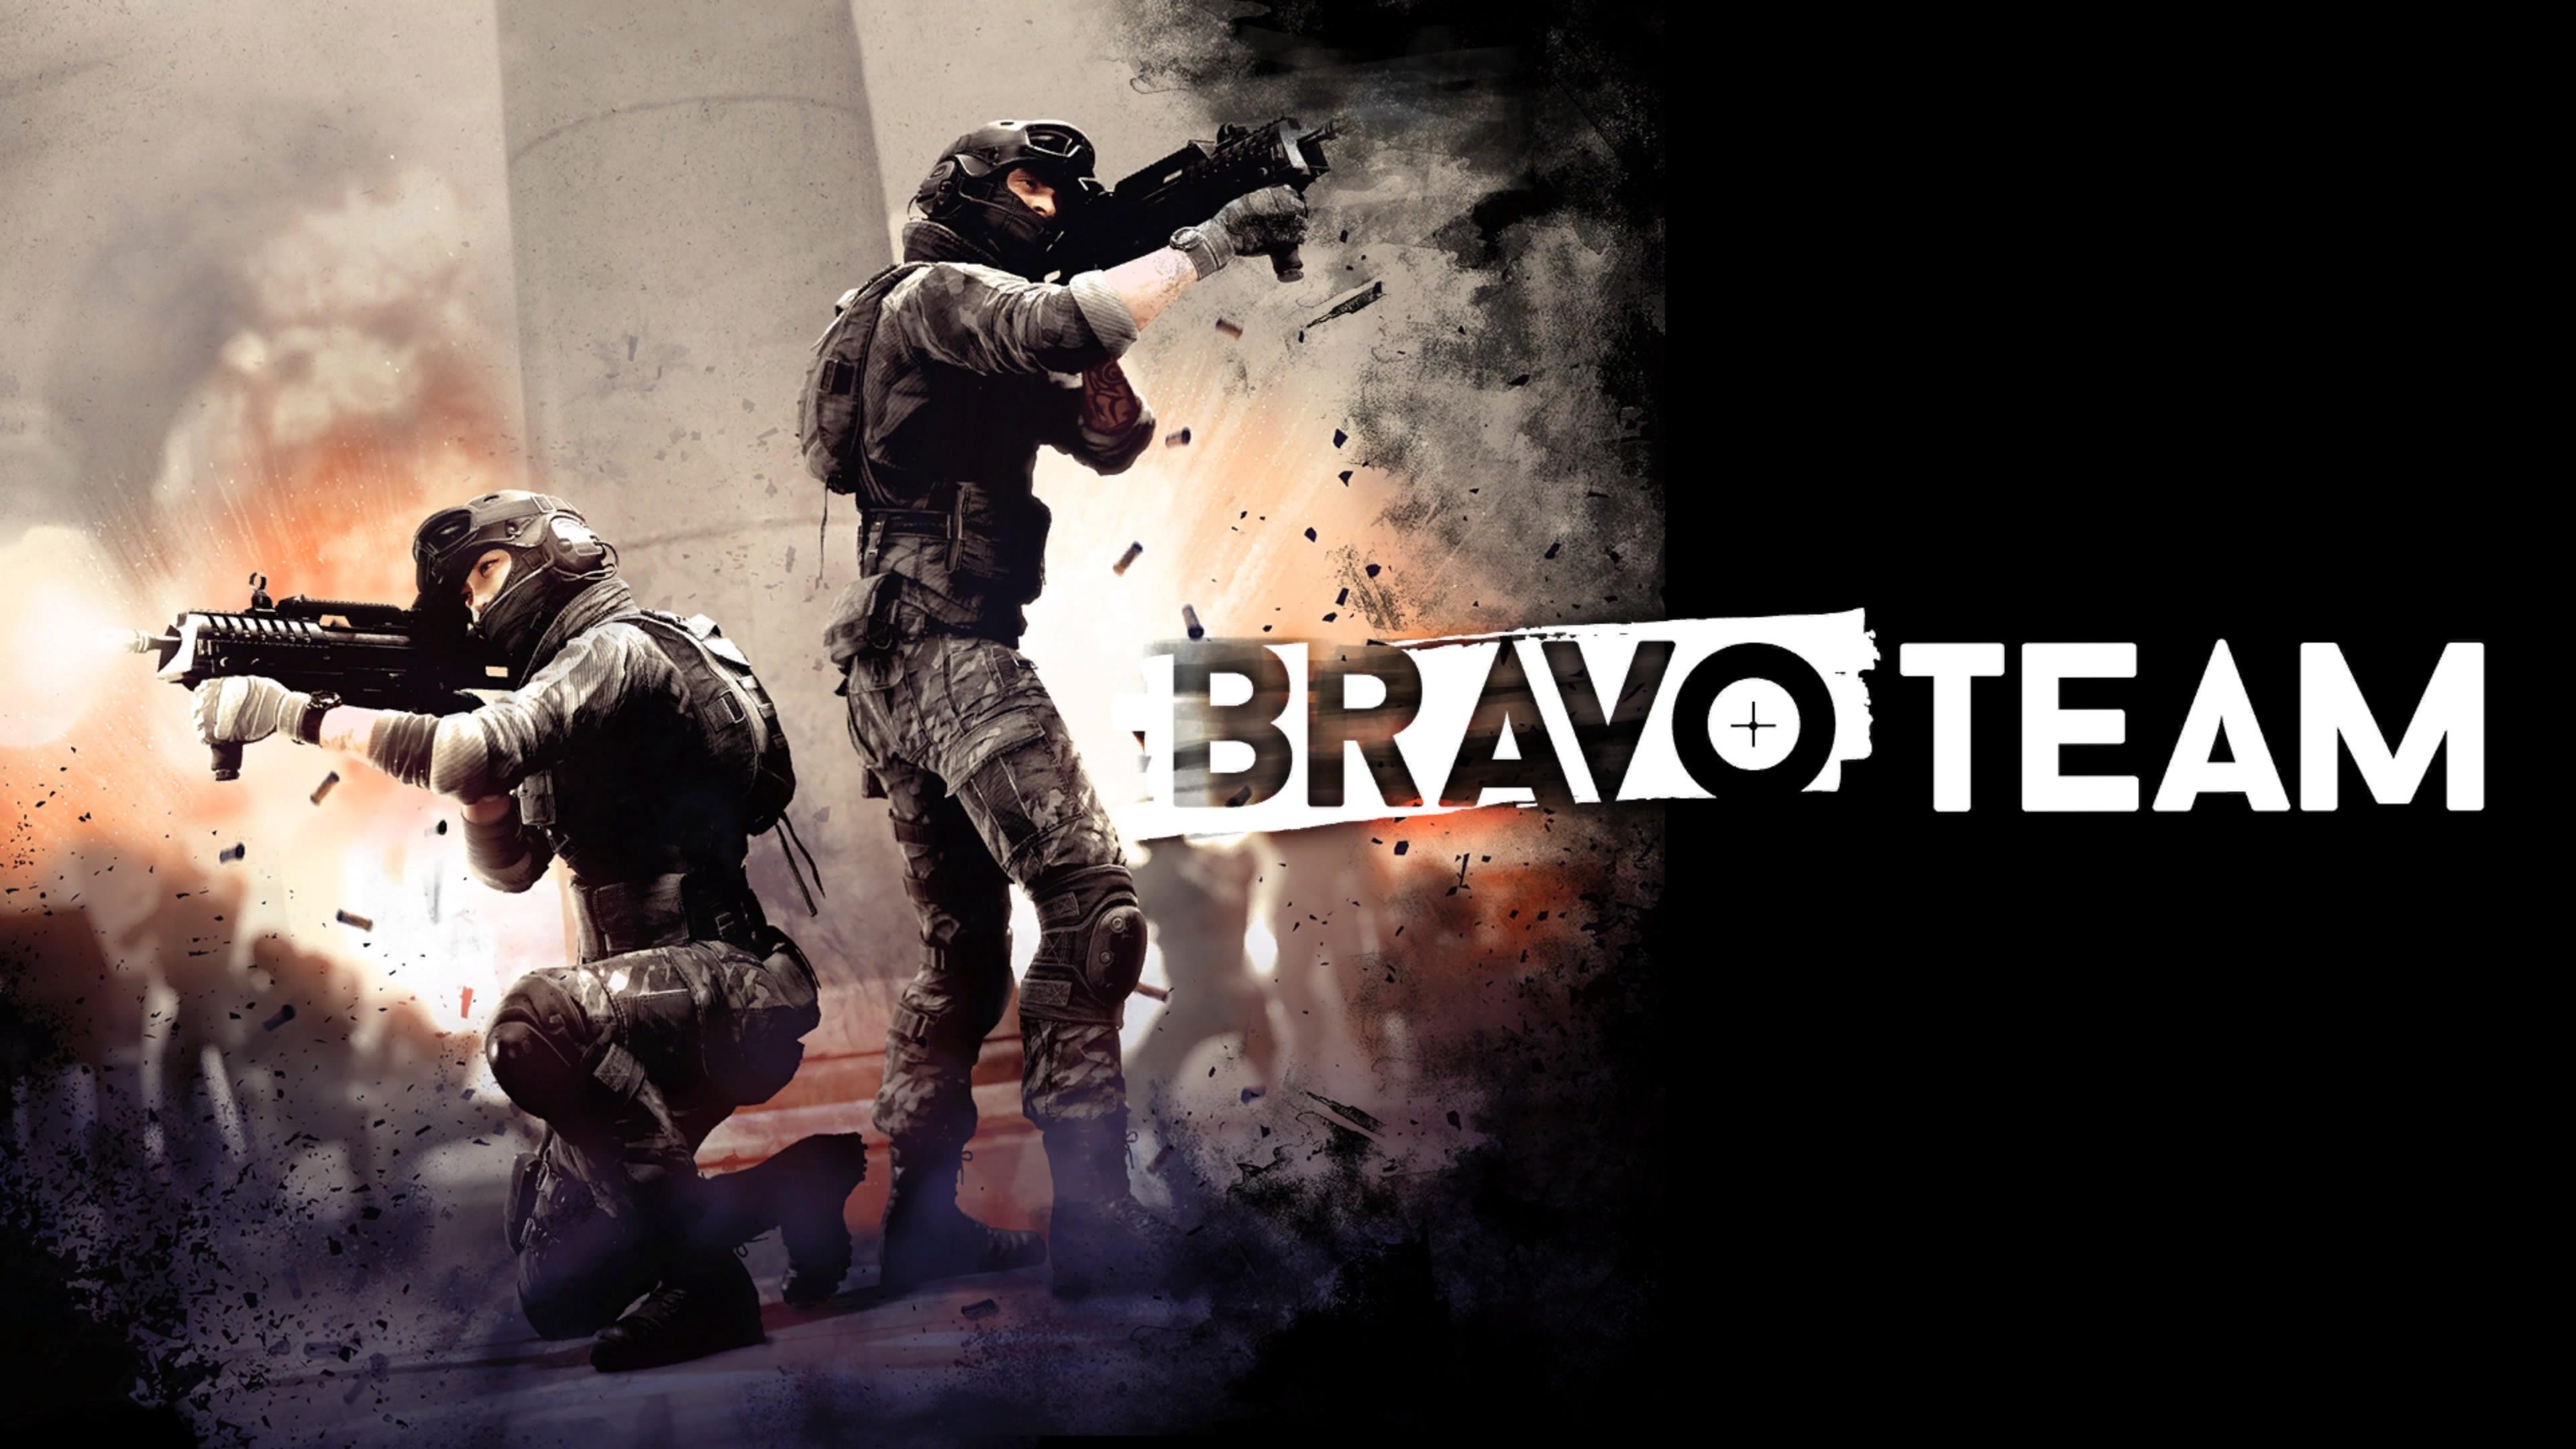 Wallpaper Bravo Team Poster Vr 4k Games 17751